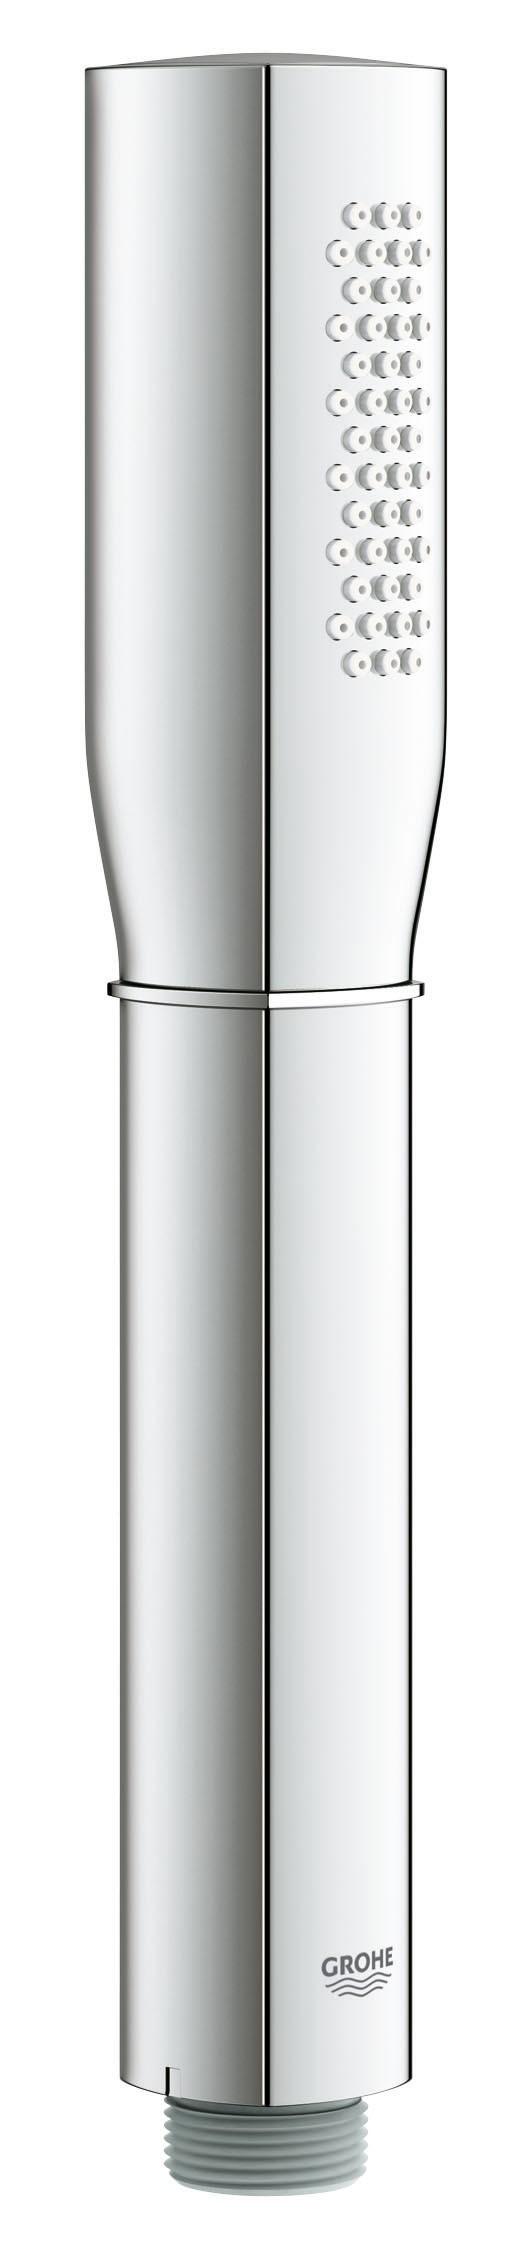 Ручной душ Grohe 26037000 Rainshower Grandera (1 режим), хром